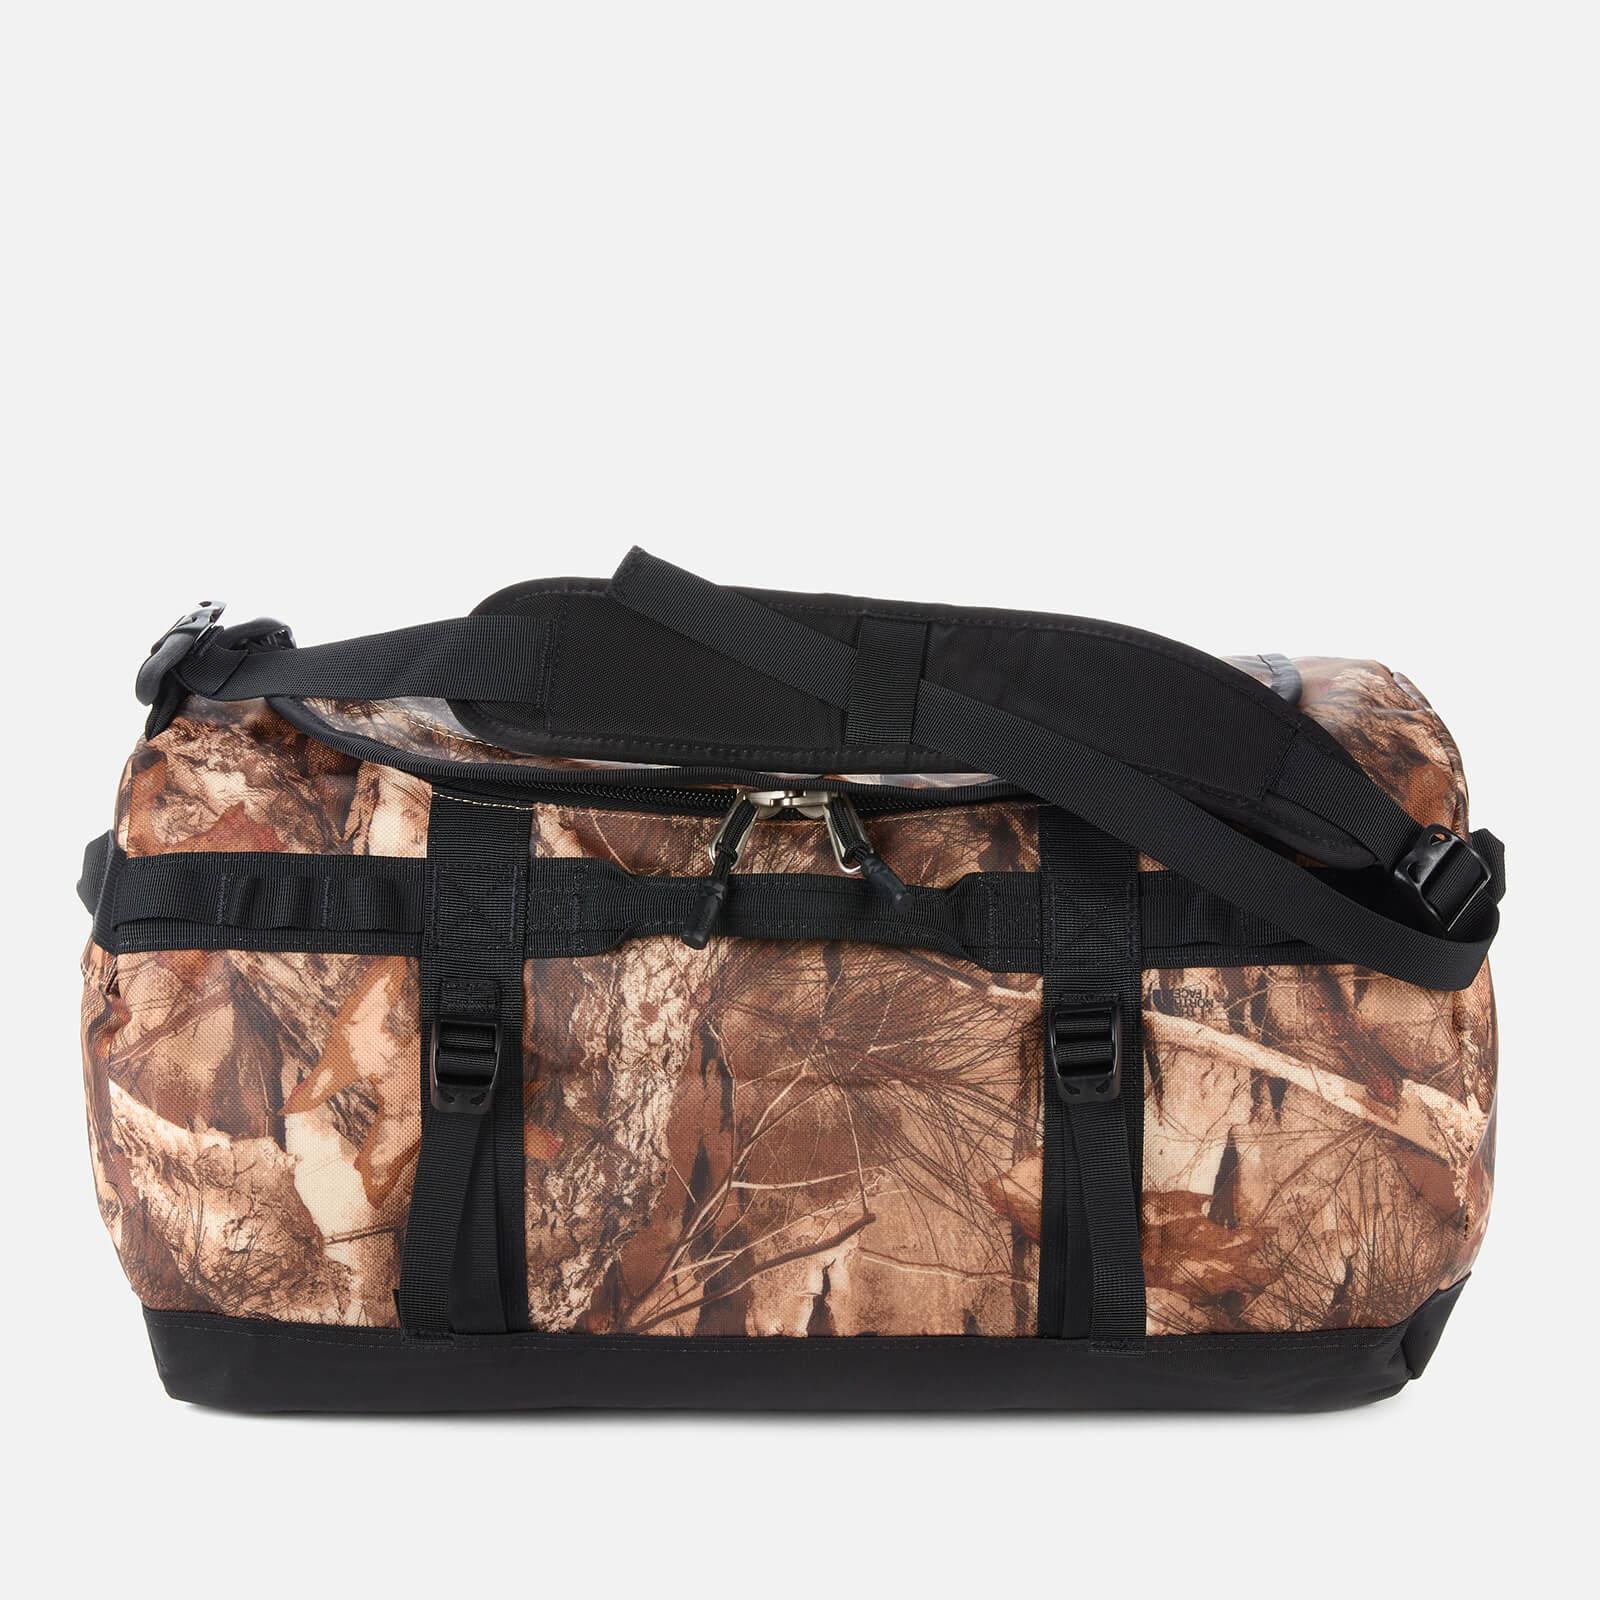 The North Face Base Camp Small Duffel Bag - Print/Black